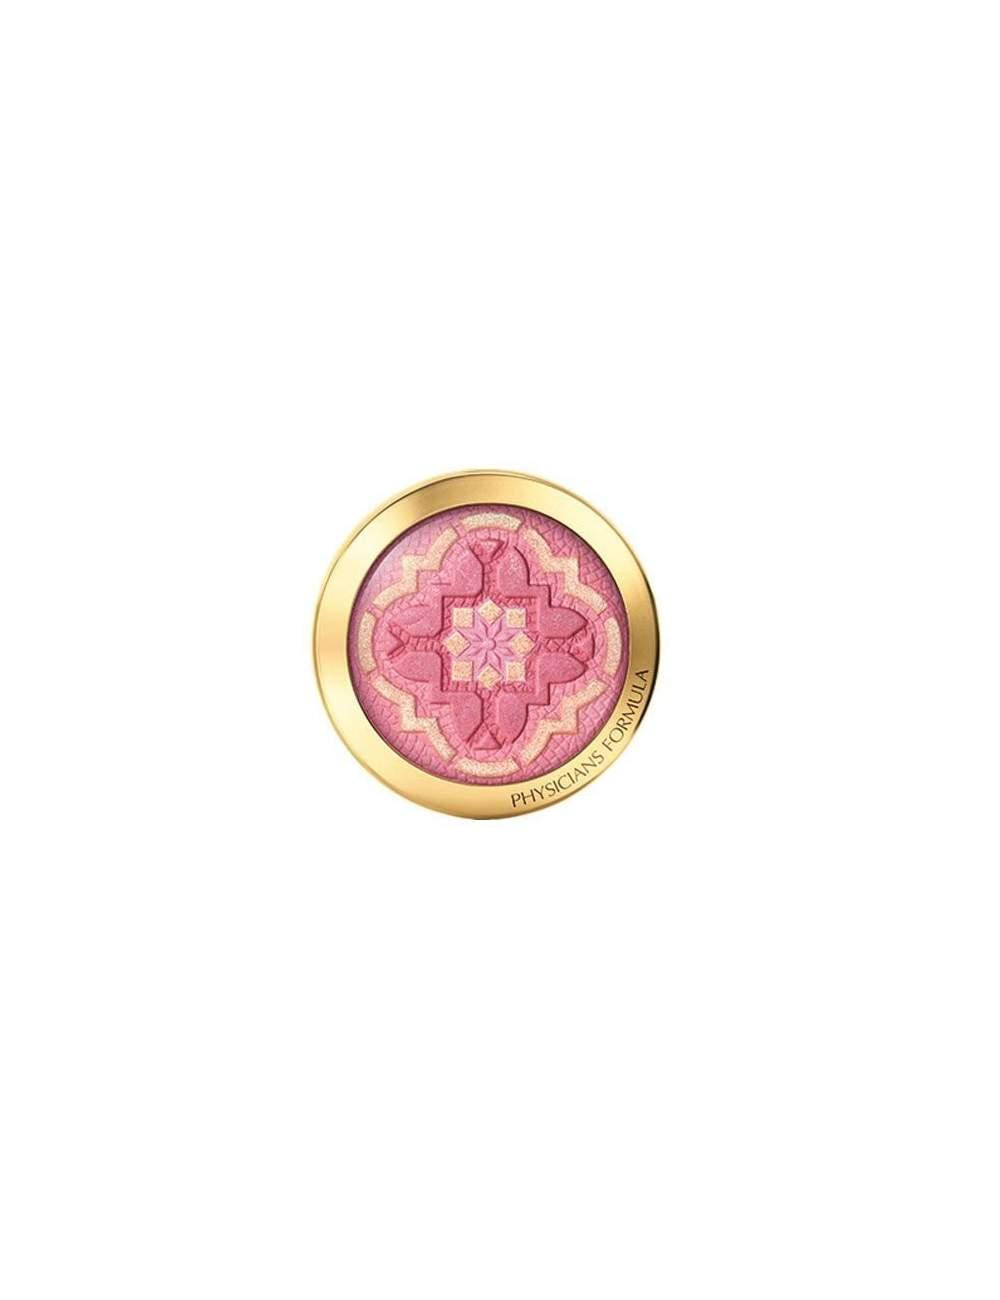 Fard d'Huile d'Argan Pure Argan Wear Rose. Physicians Formula